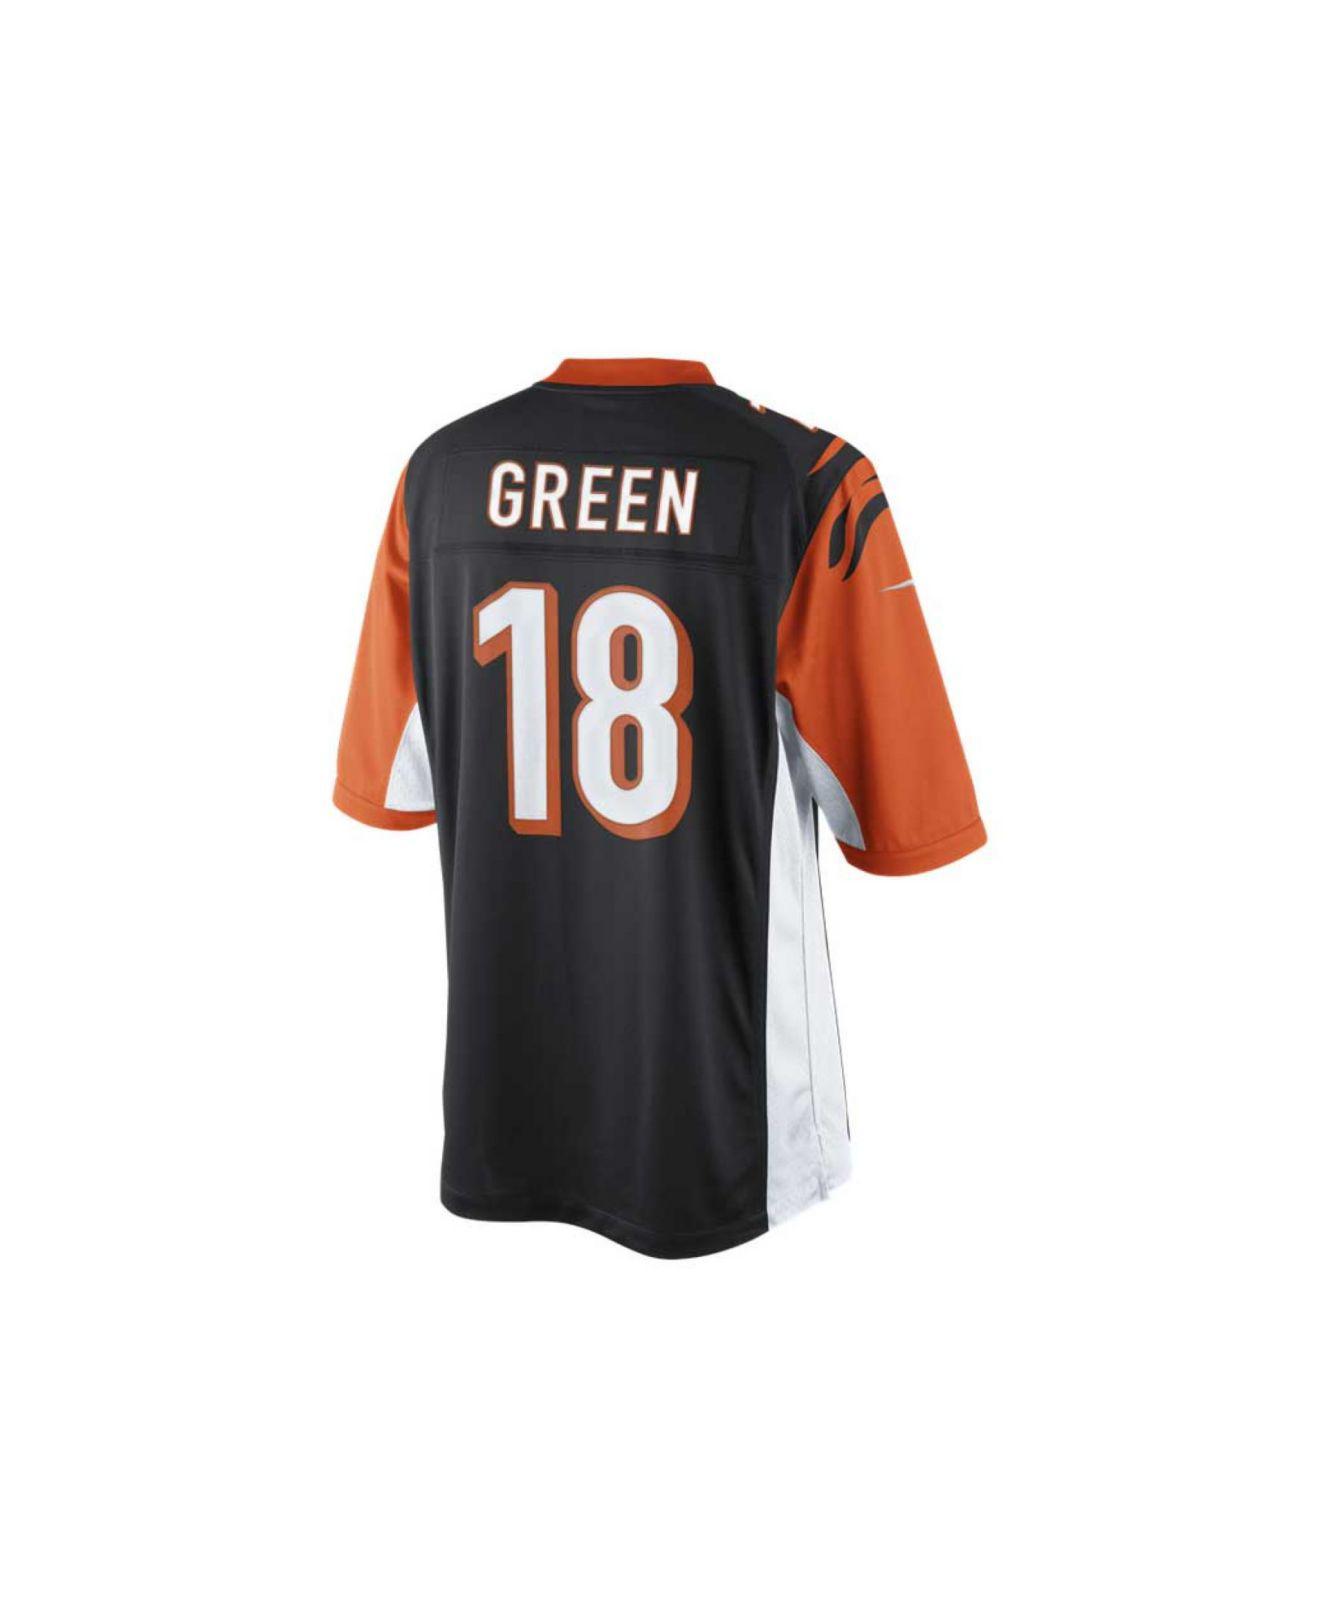 aj green limited jersey